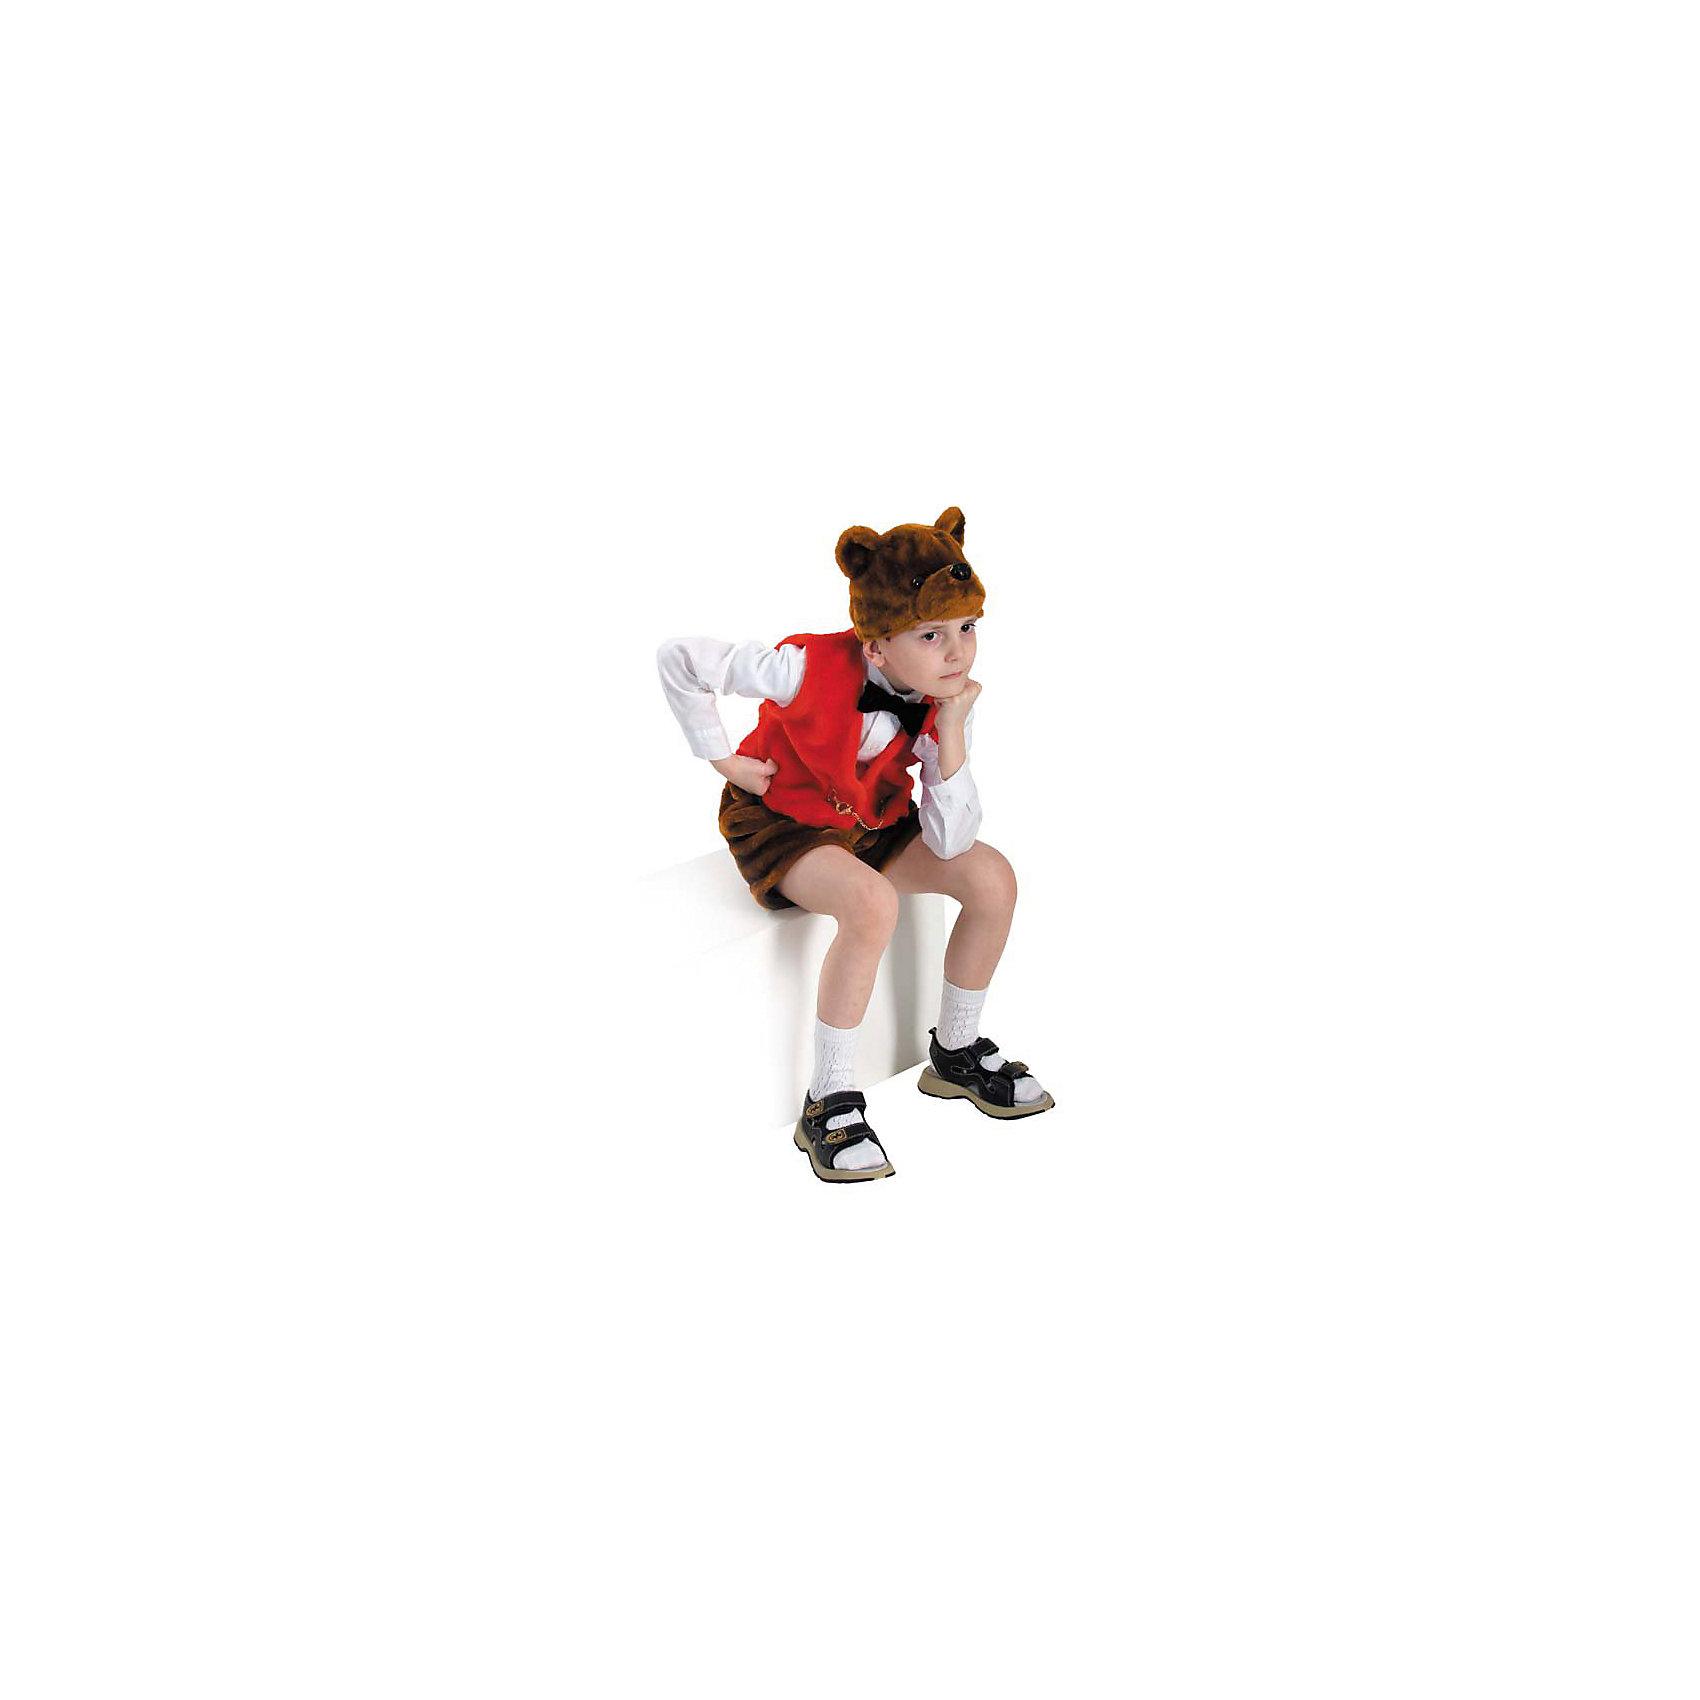 Батик Карнавальный костюм Медведь Михей, Батик батик карнавальный костюм фея фауна